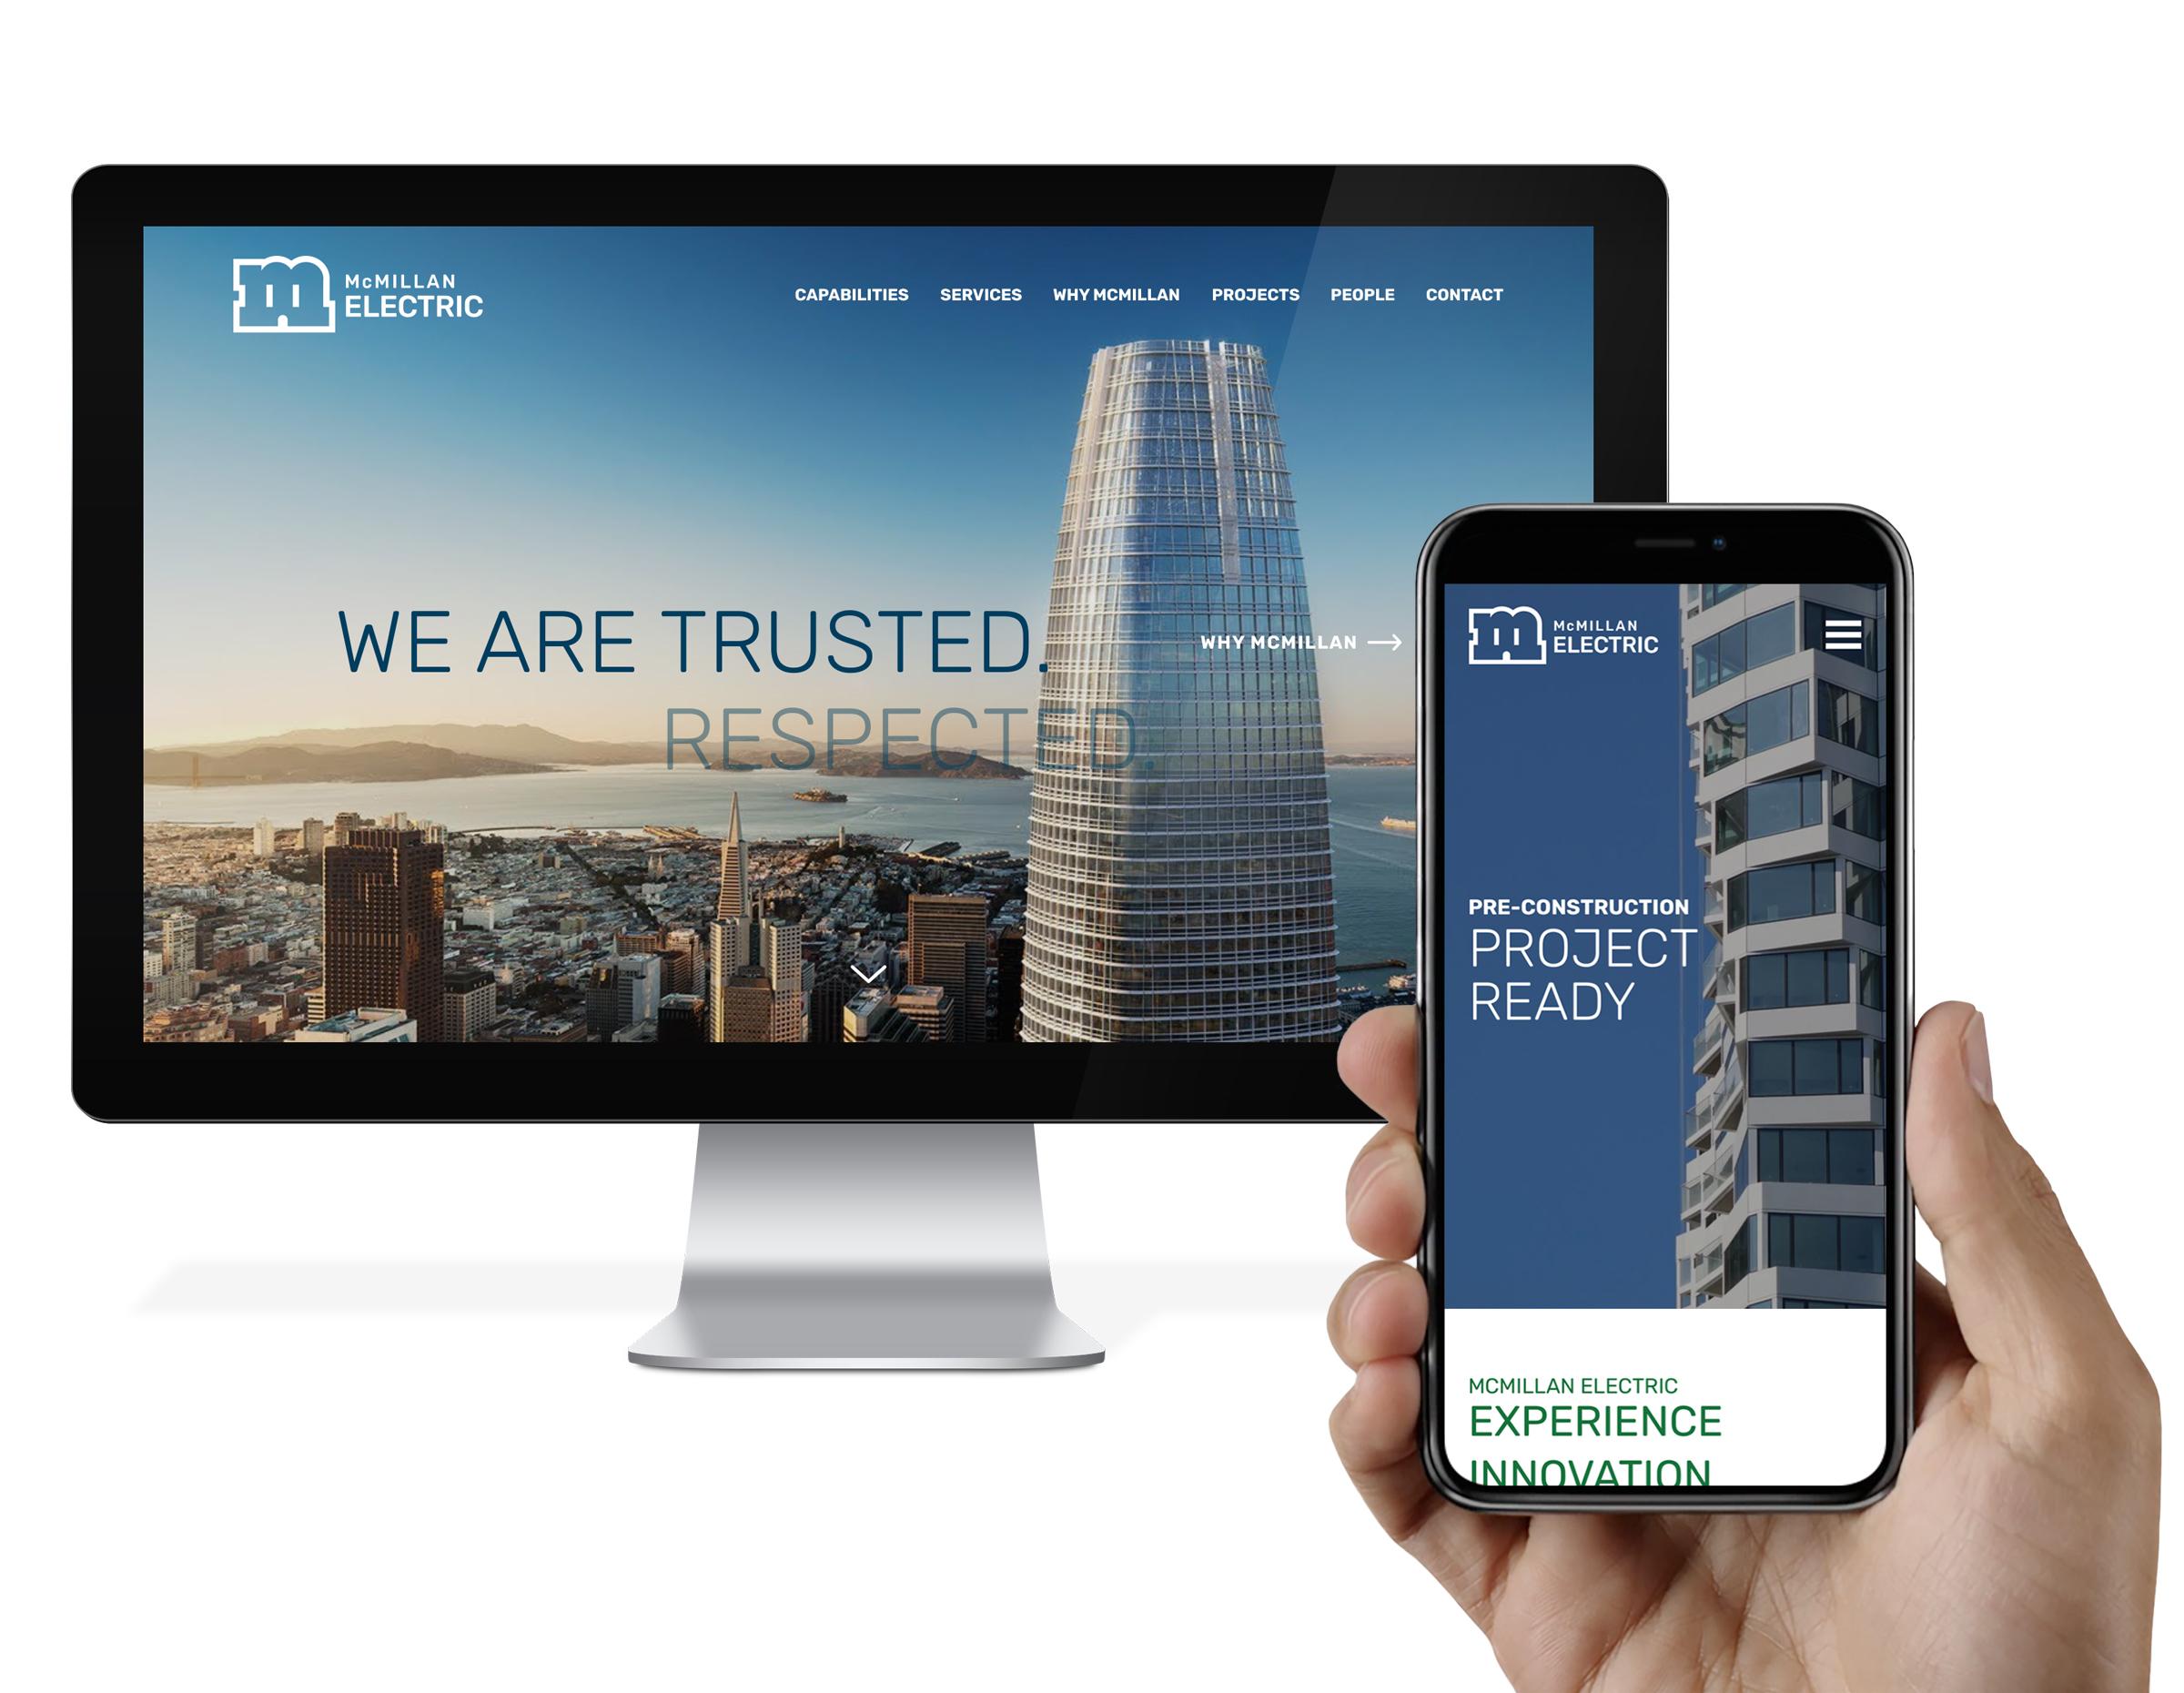 McMillan Electric website design responsive view